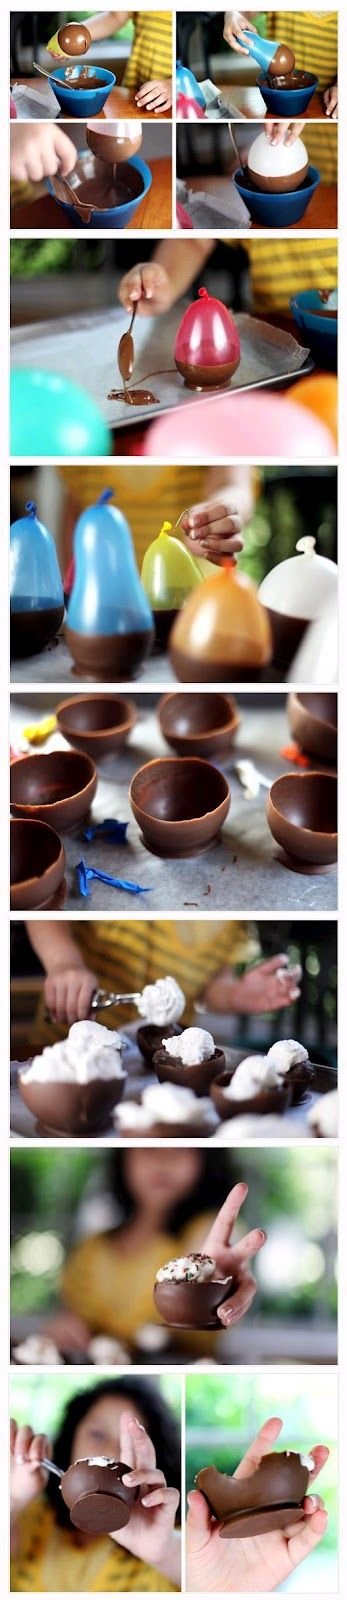 How to make: Chocolate Bowls